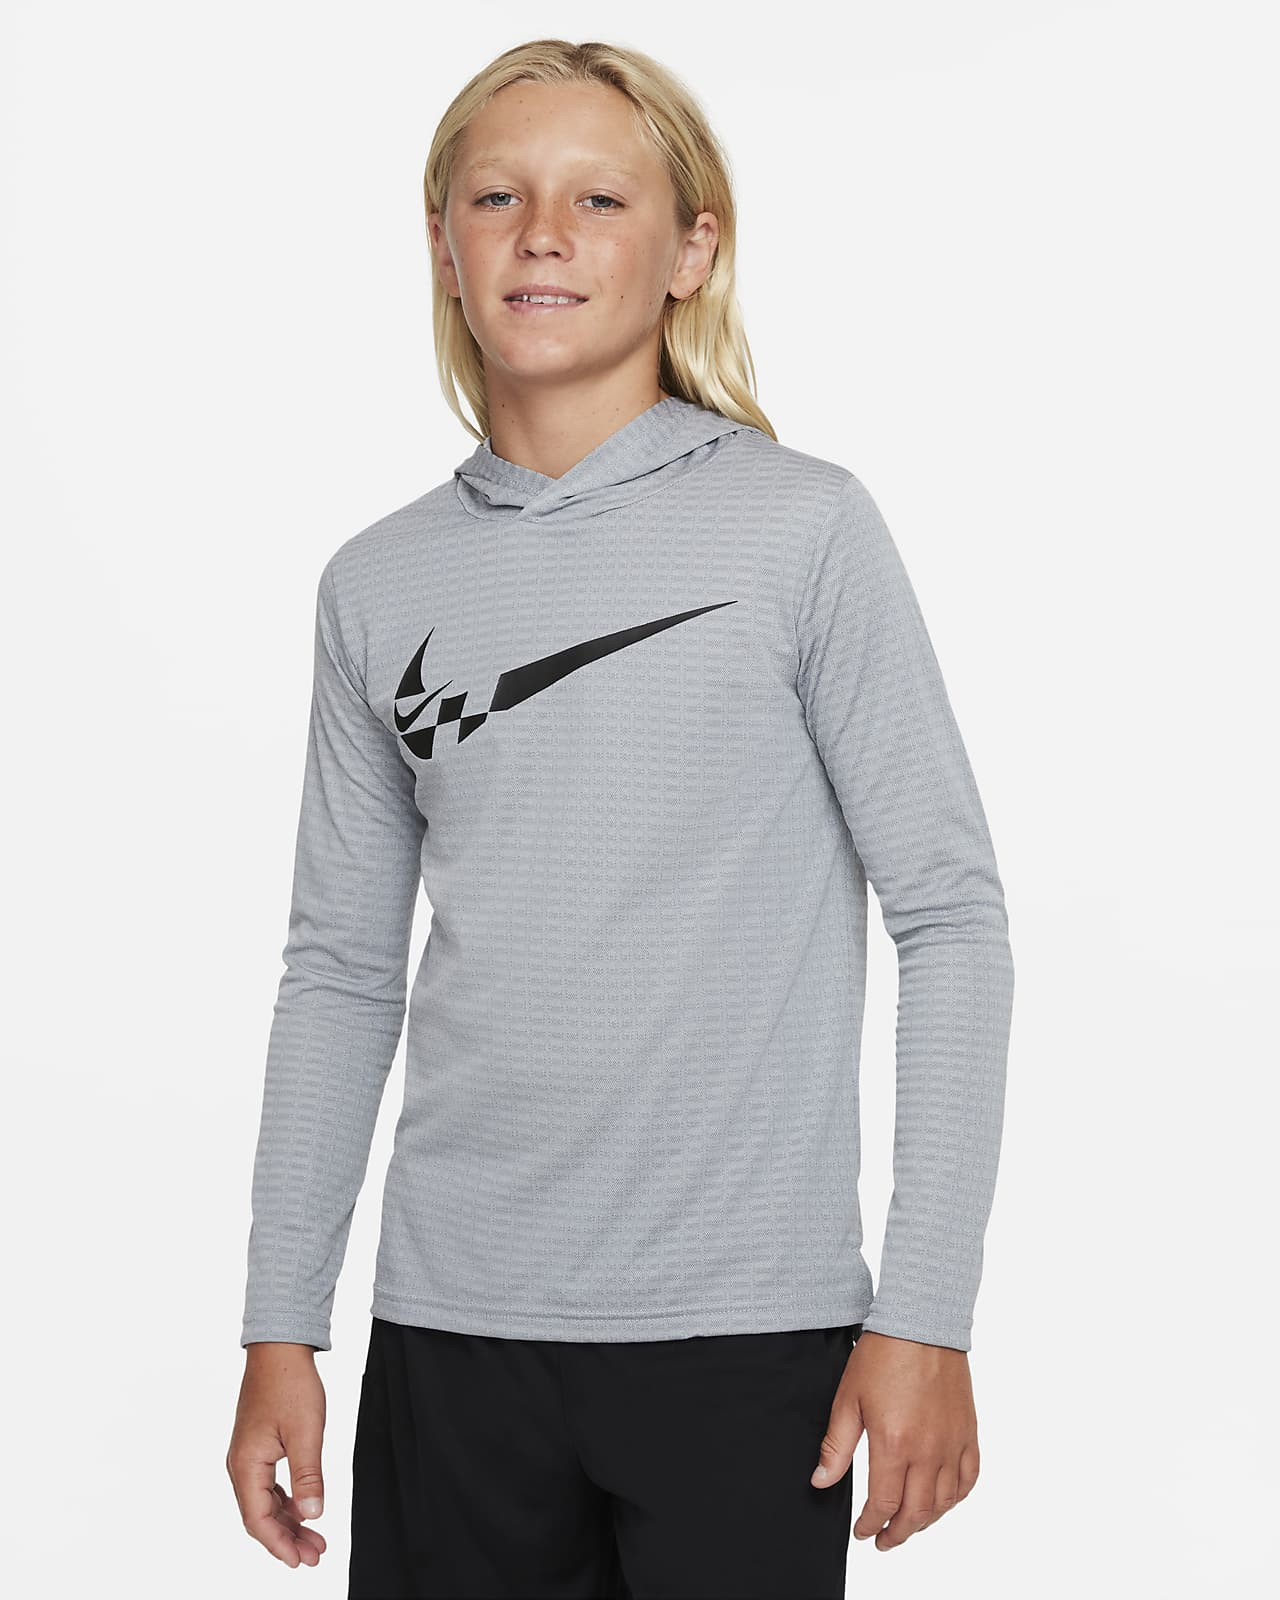 Nike Breathe Big Kids' (Boys') Graphic Hooded Training Top